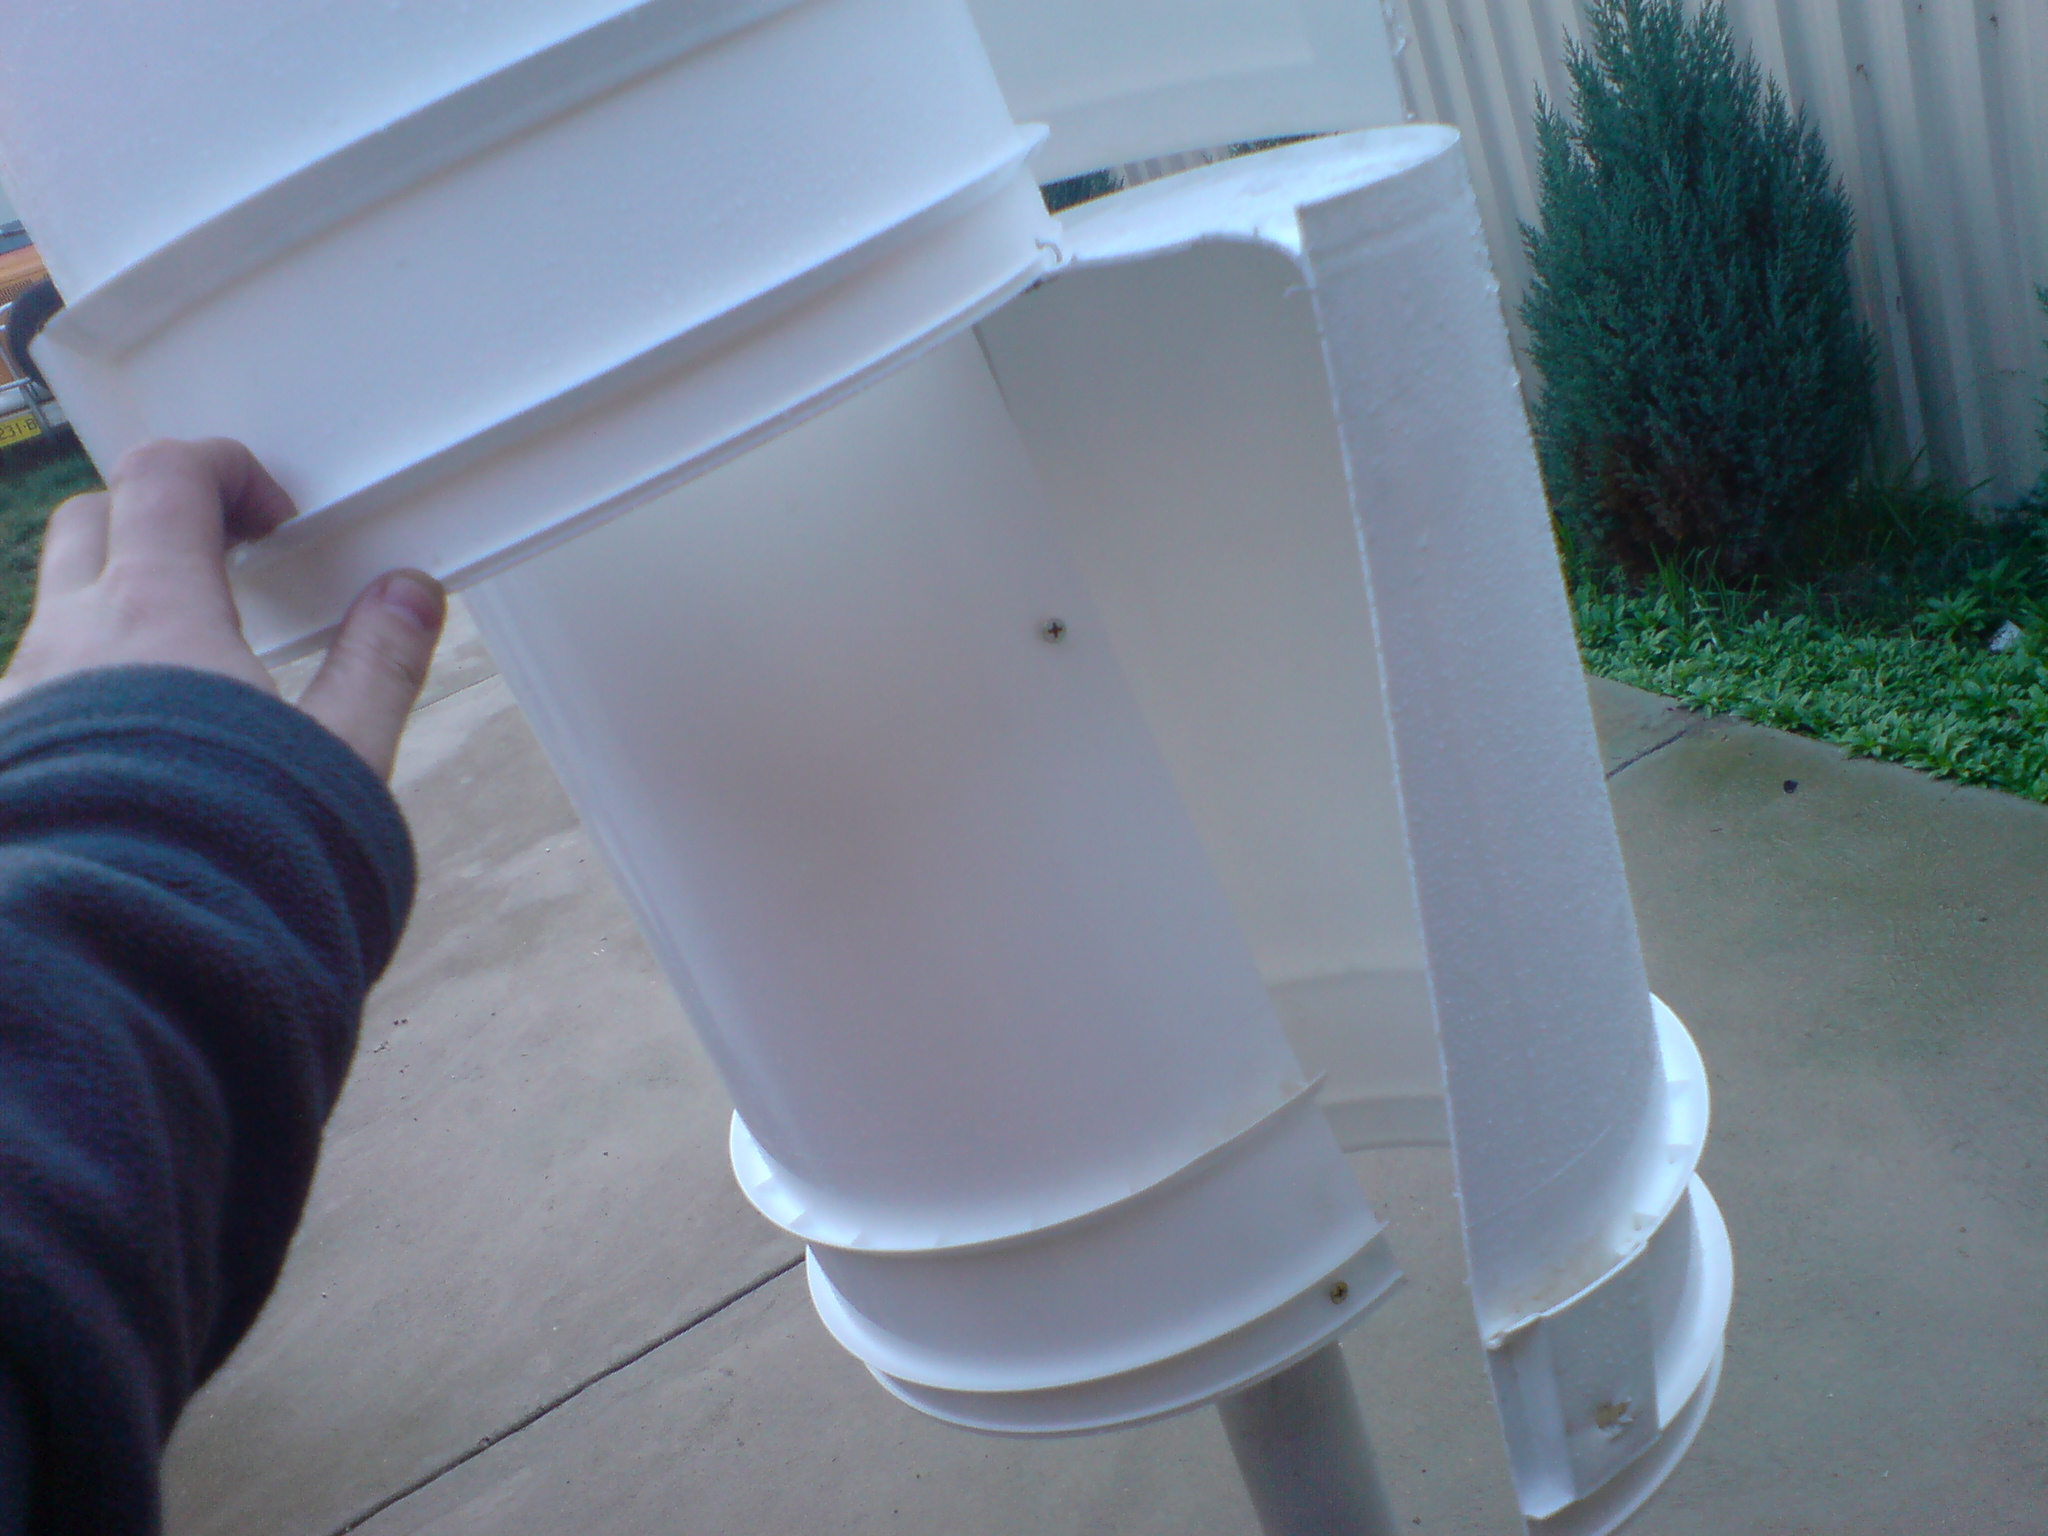 Build your own Savonius VAWT (Vertical Axis Wind Turbine)